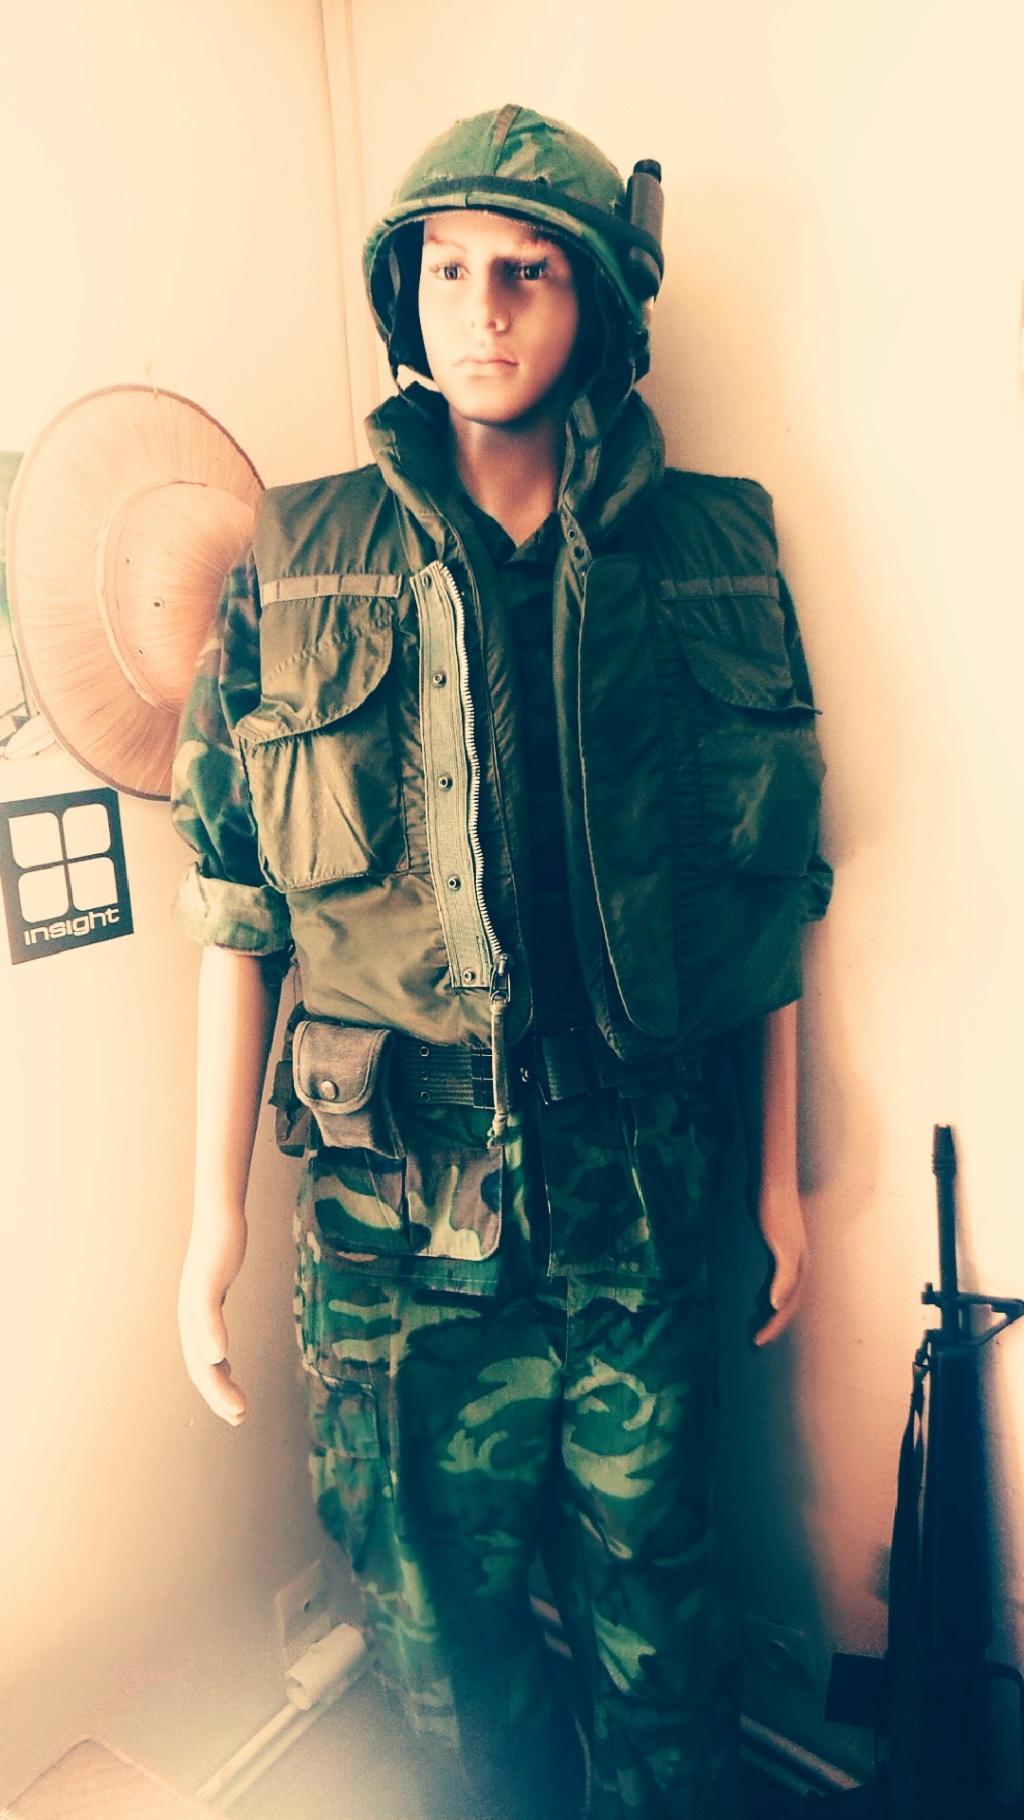 Body armor 3/4 colar Infanterie _2019010